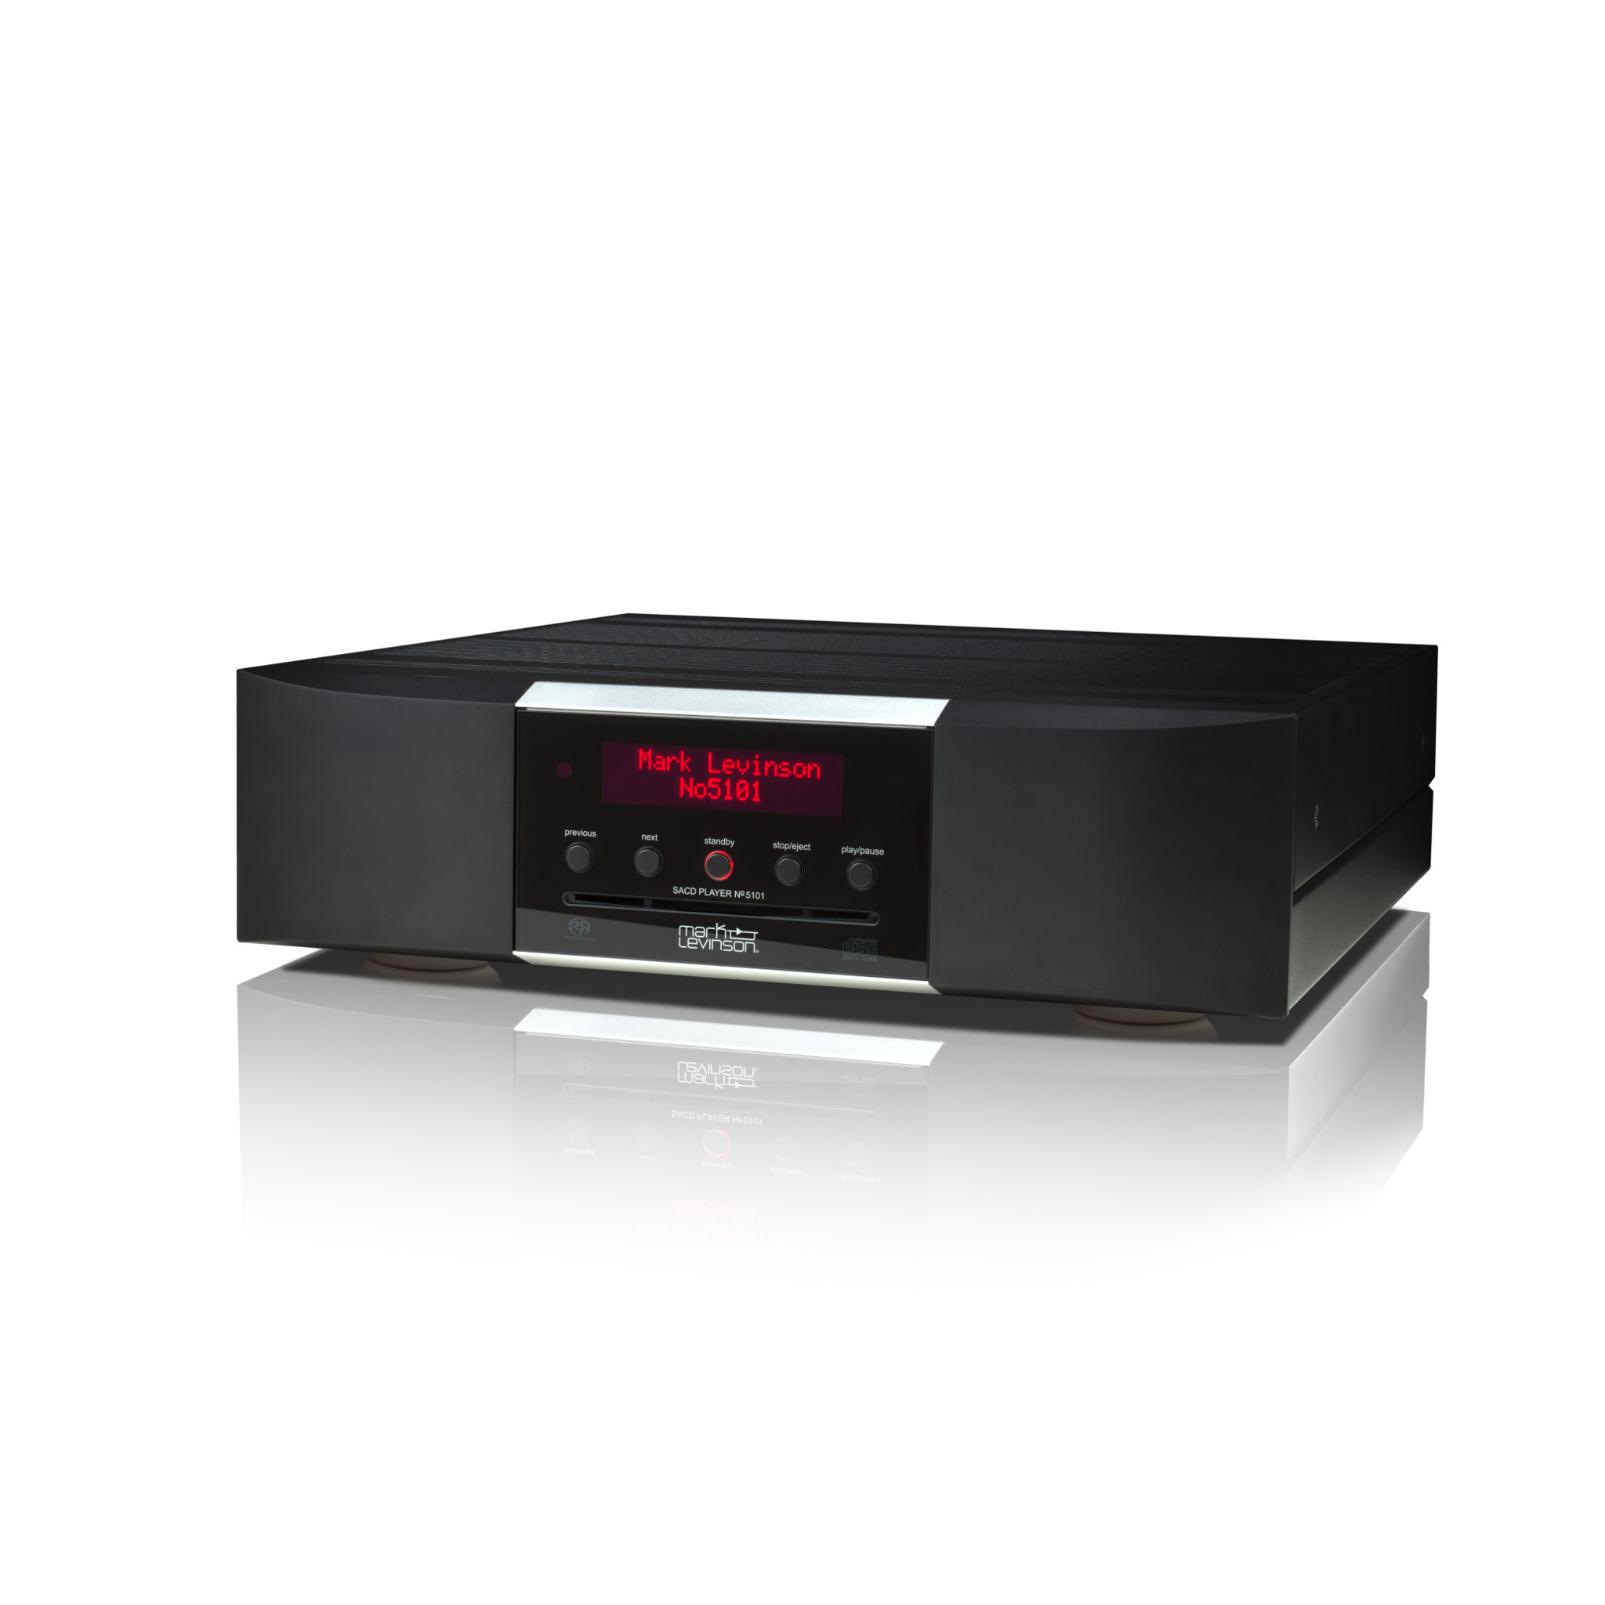 № 5101 - Black - Network Streaming SACD Player and DAC - Hero